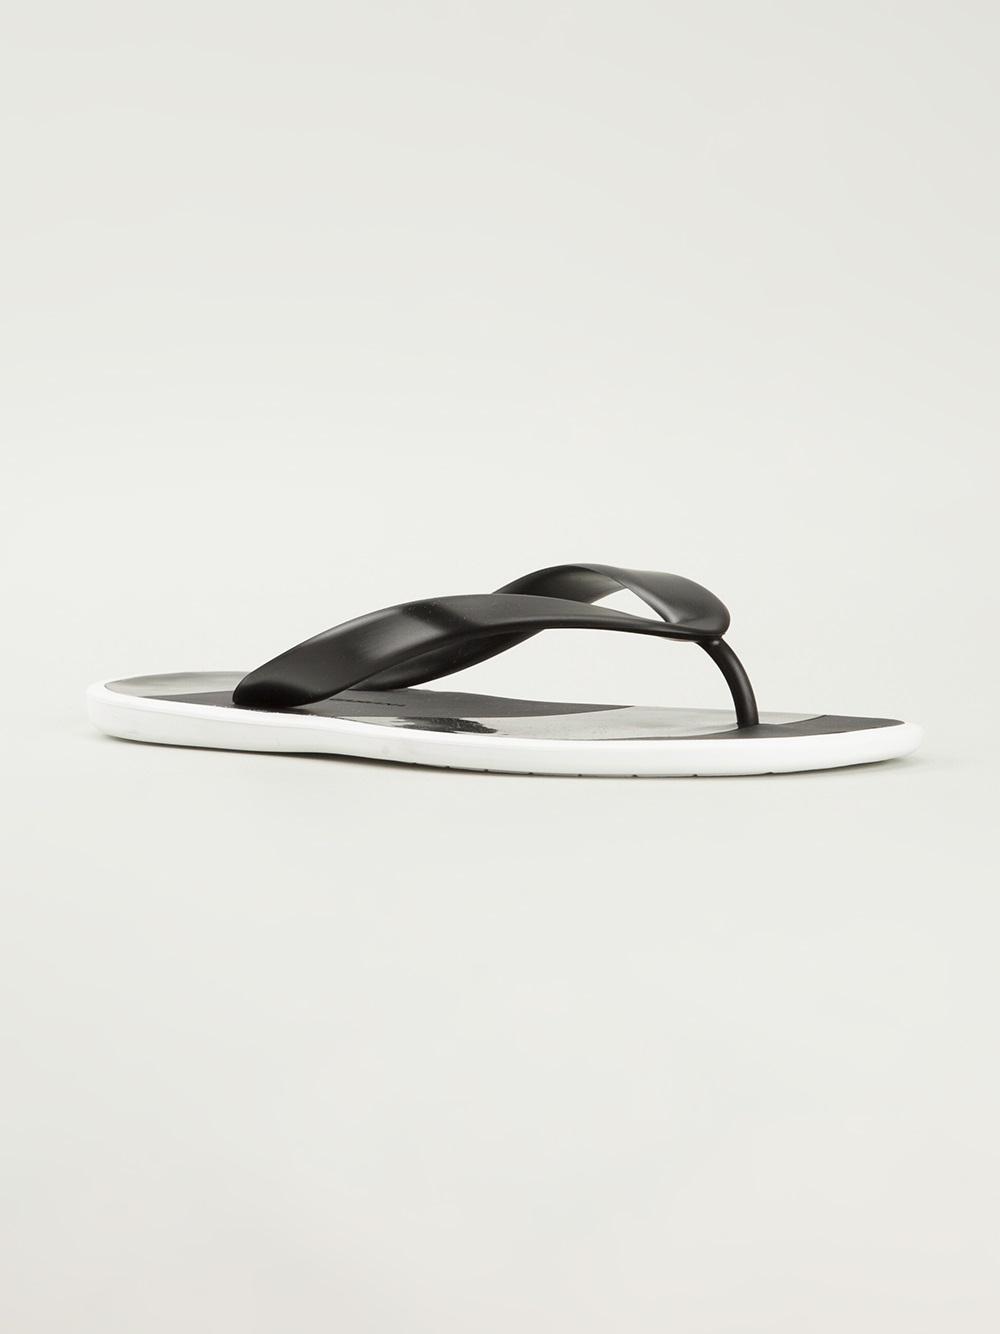 0d1c93f1a190cb Lyst - Dolce   Gabbana Monochrome Flip Flops in Black for Men